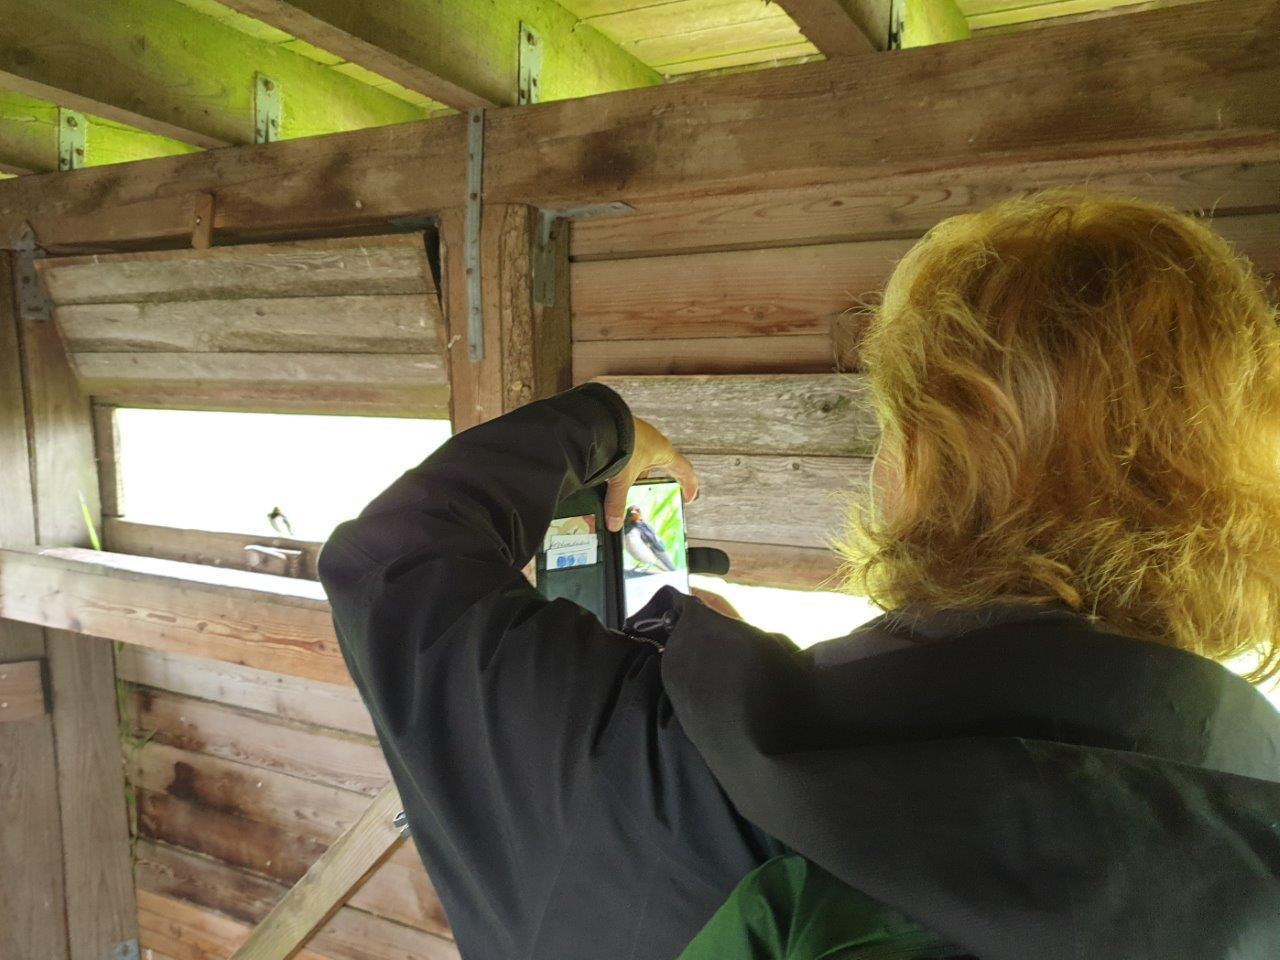 Boerenzwaluw fotograferen